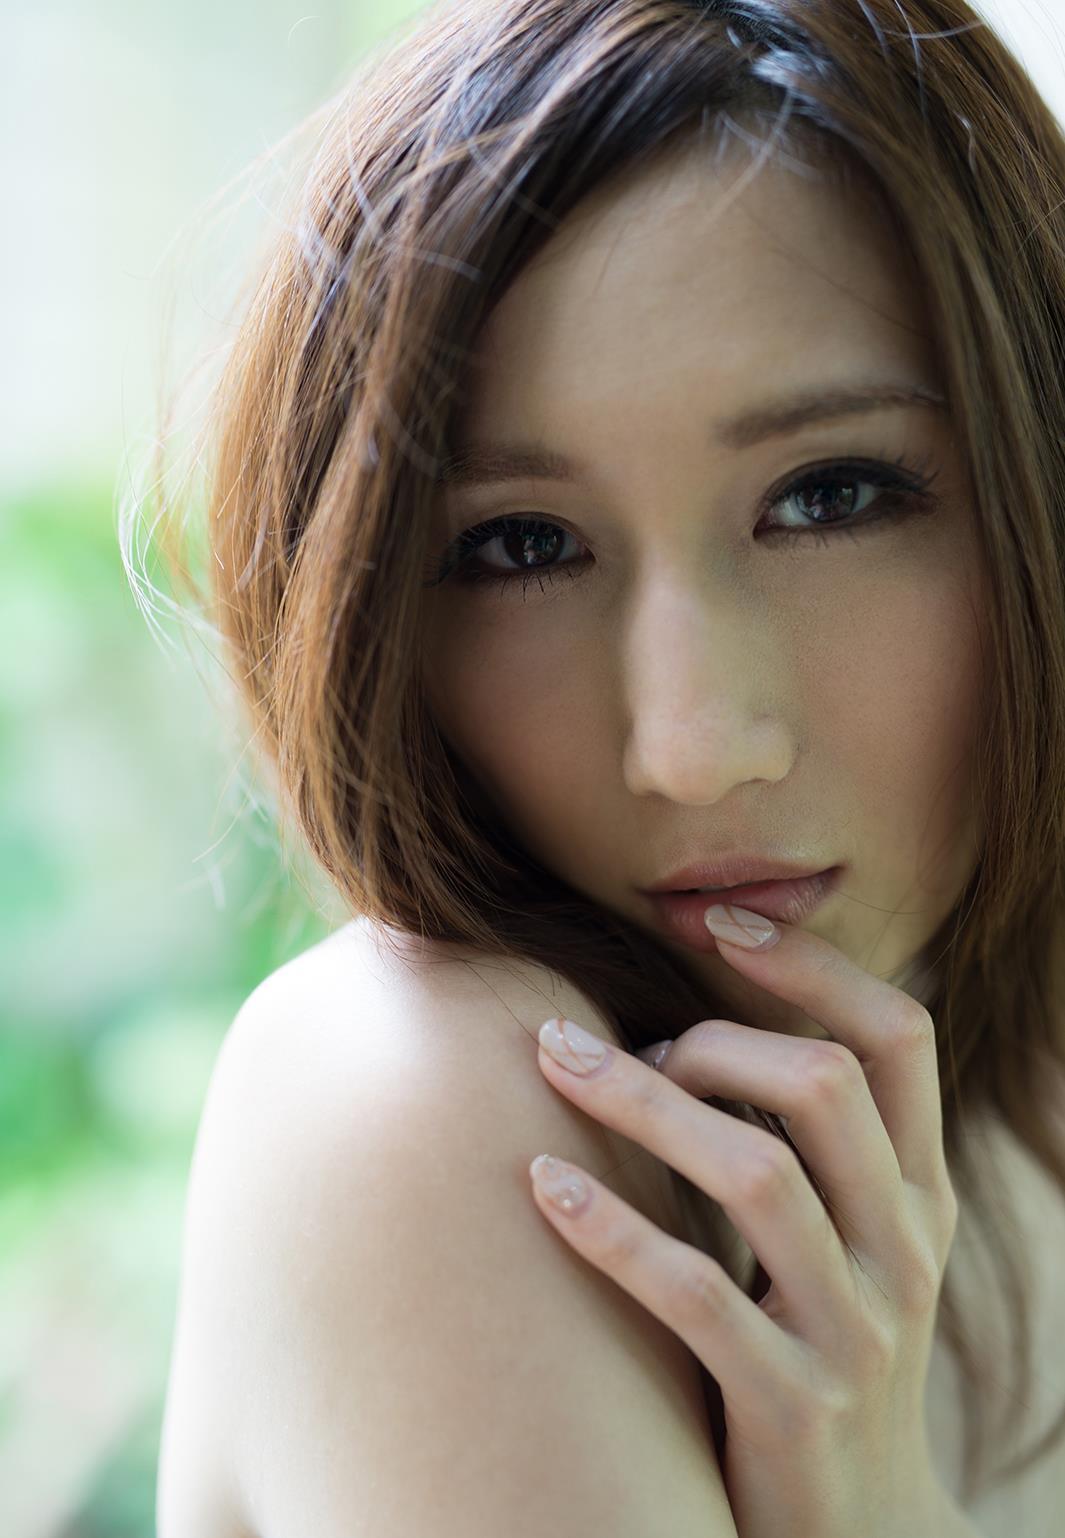 AV女優・JULIA(ジュリア) ヌード画像 97